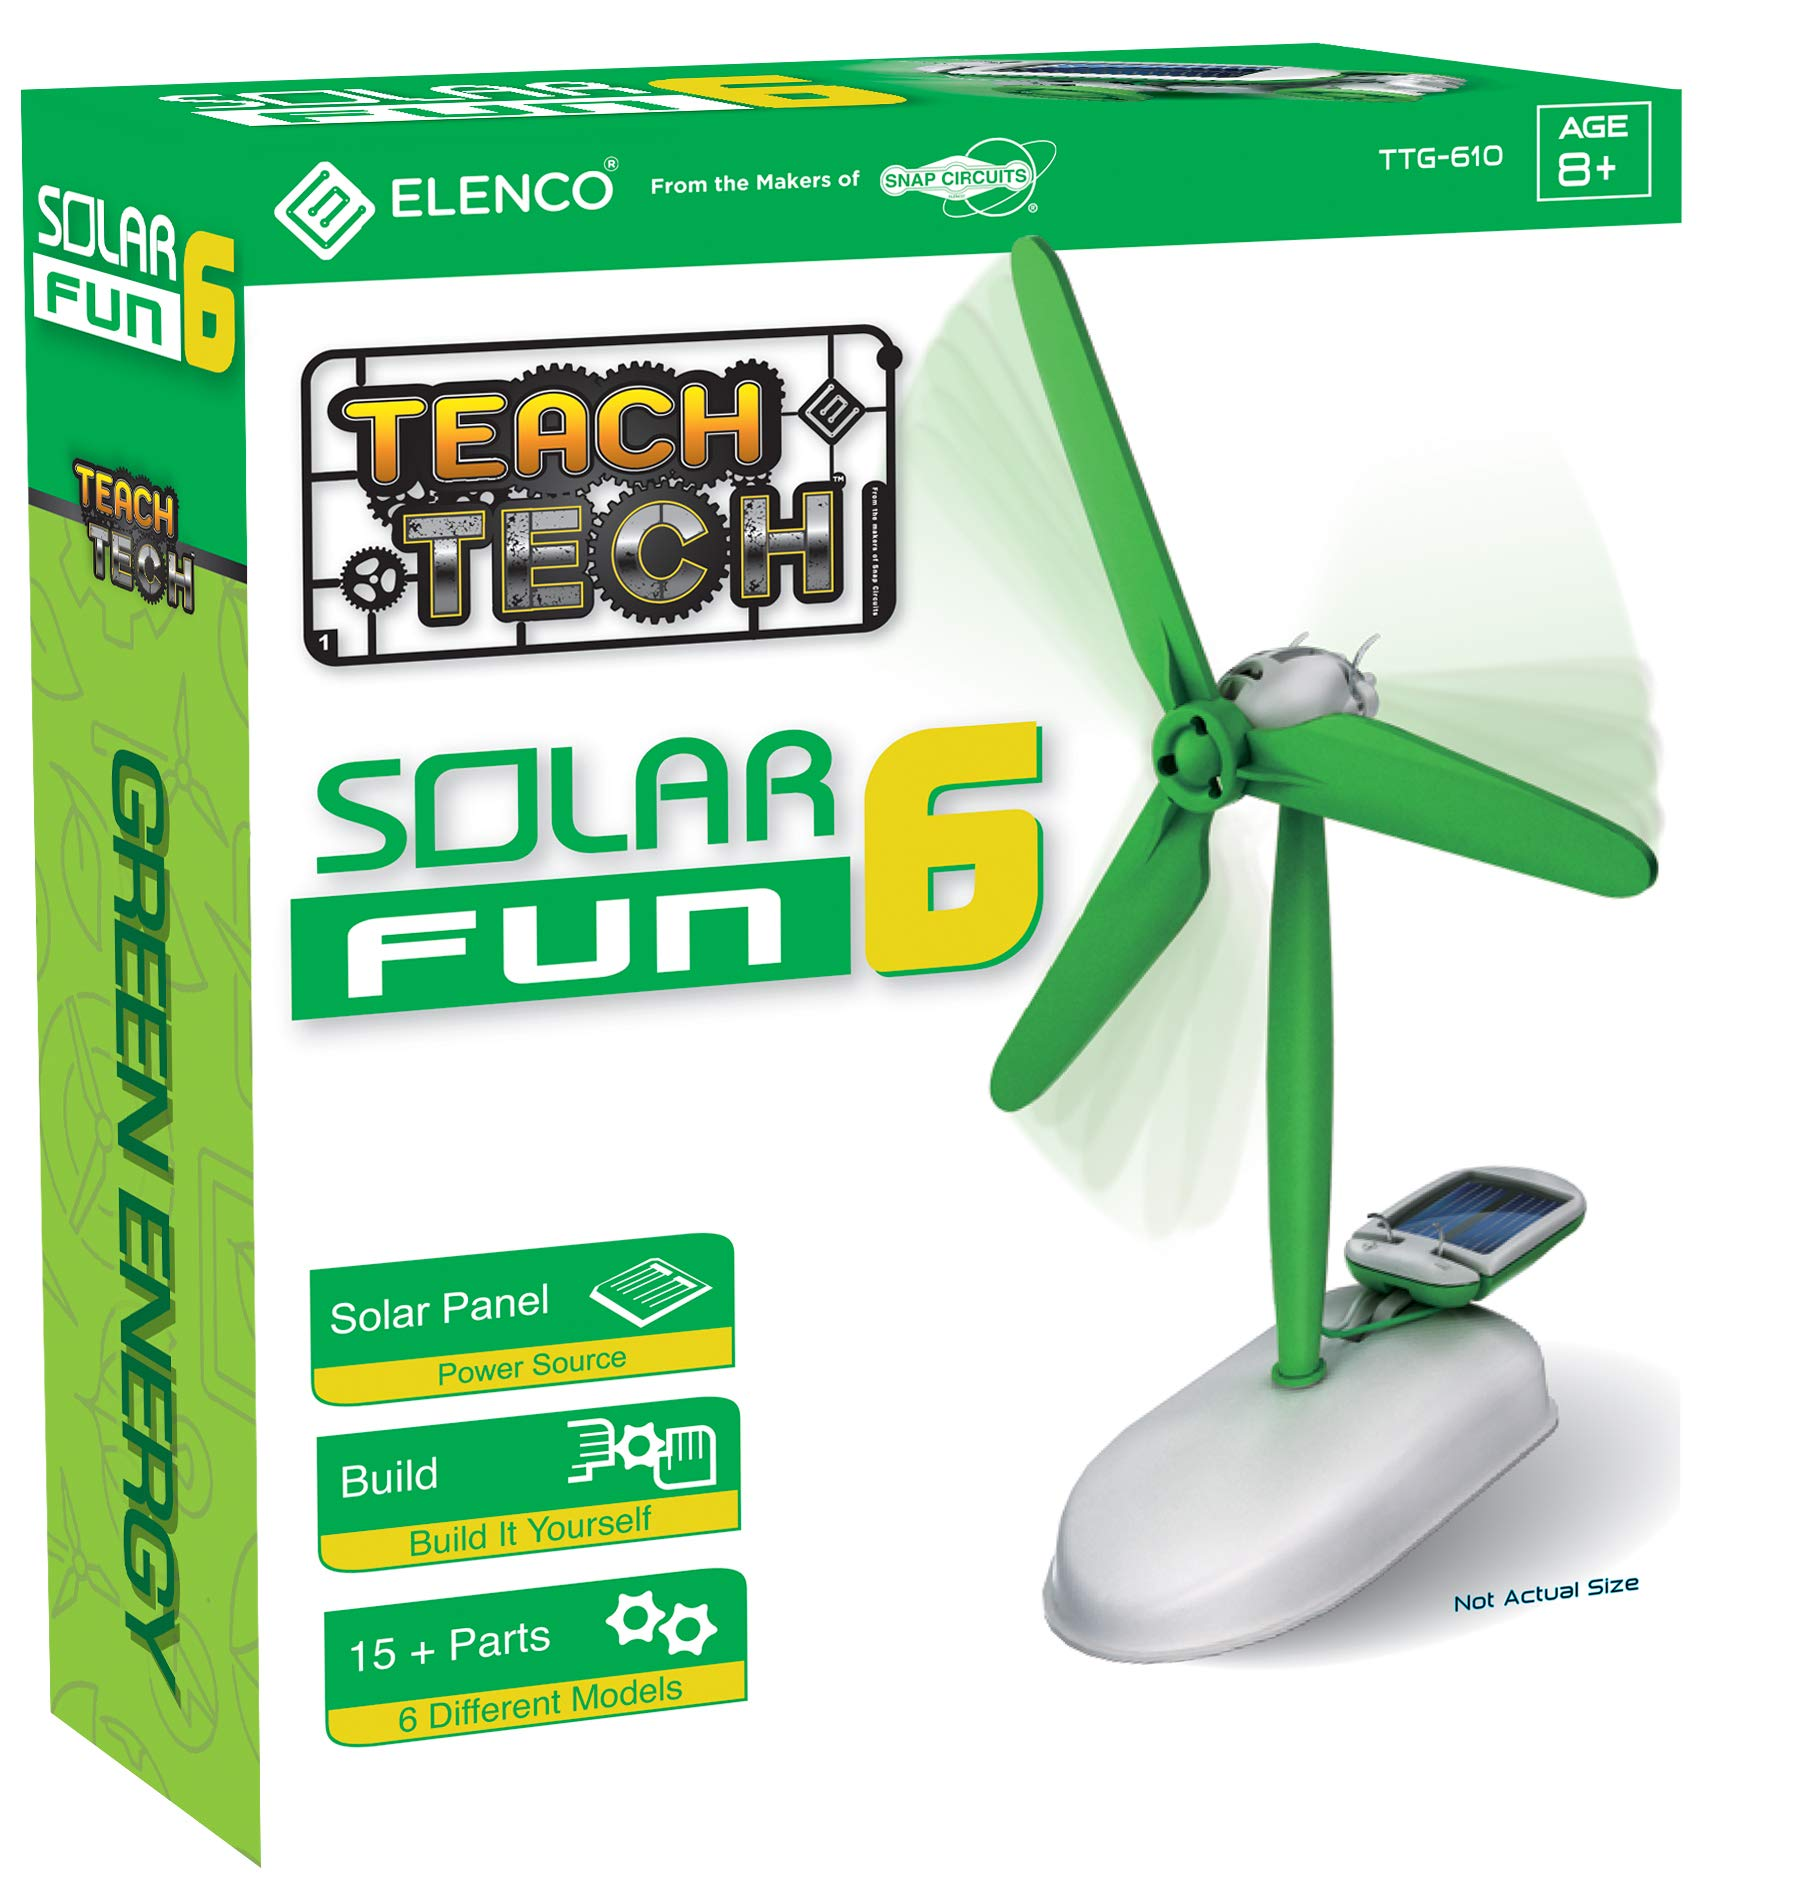 Elenco Teach Tech Solar Fun 6 | Build-It-Yourself 6-in-1 Solar Powered Robot | STEM Educational Toys for Kids 8+ by Elenco